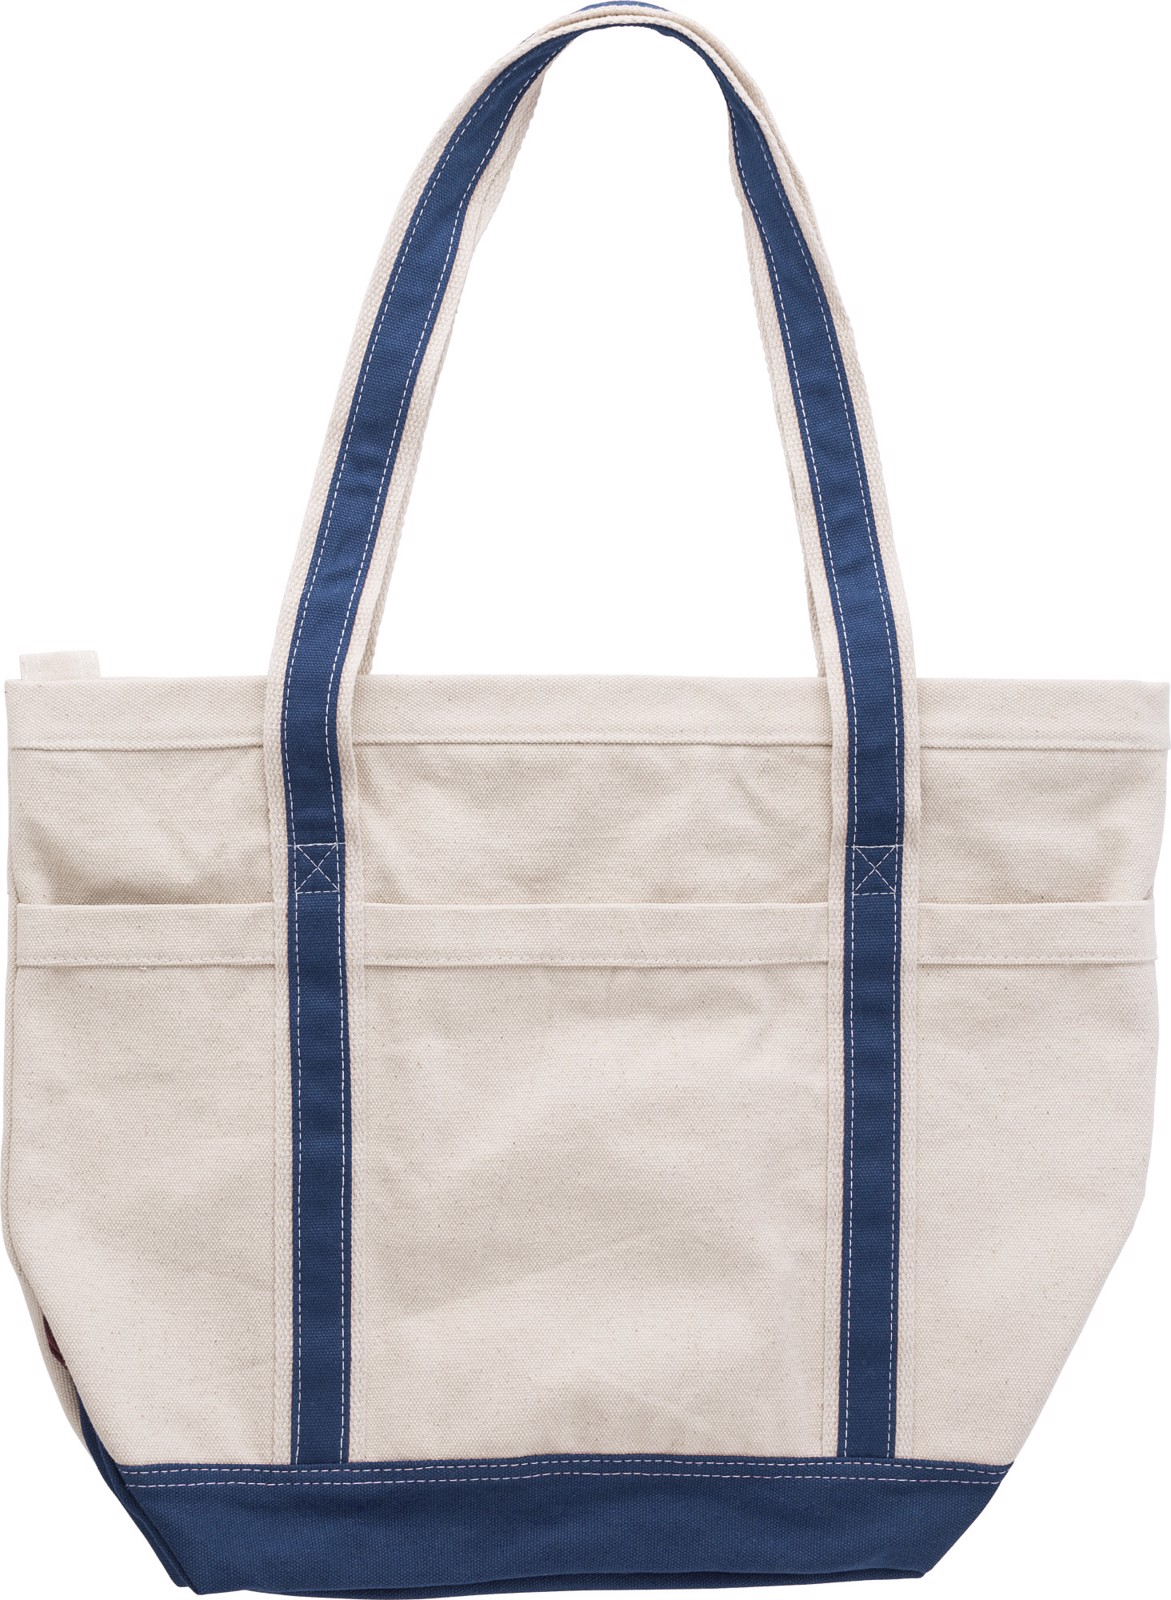 Cotton (500 gr/m²) shopping bag - Blue